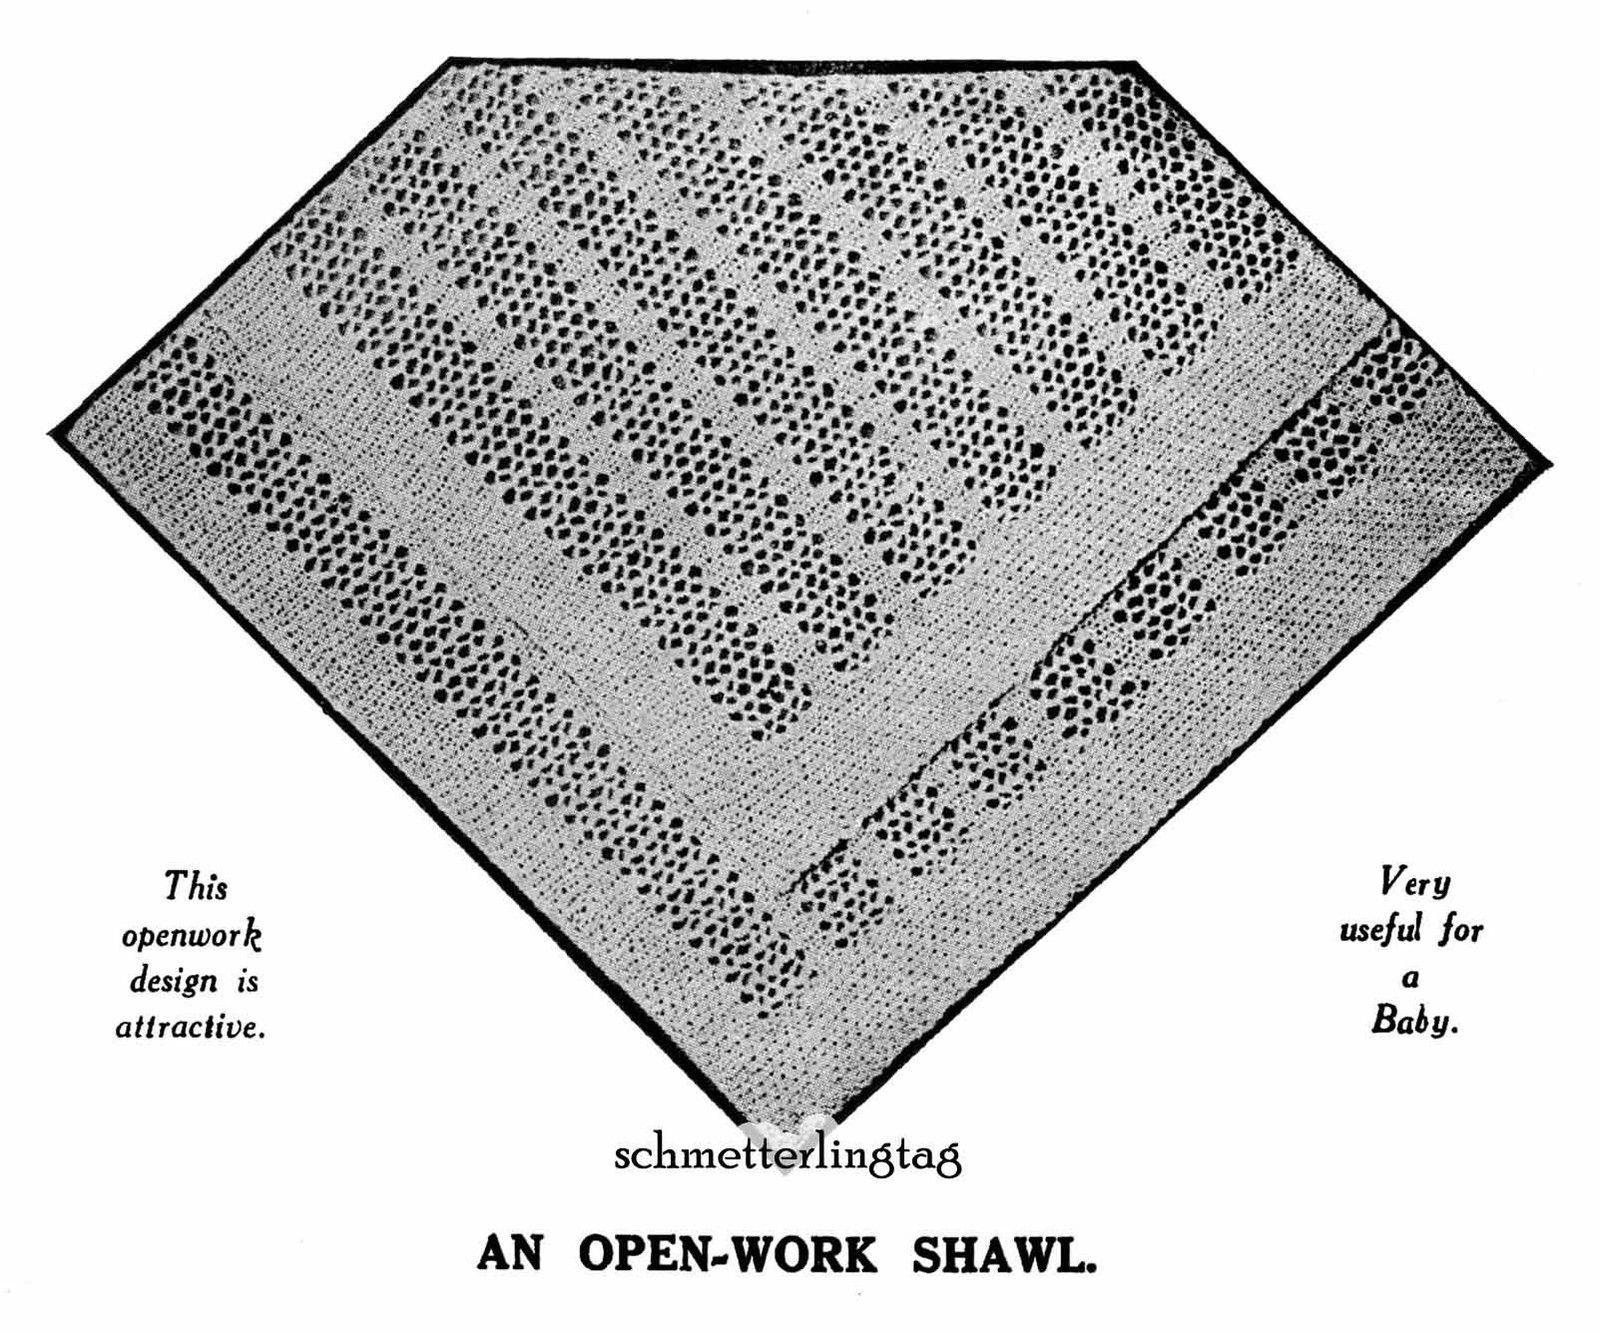 1924 Flapper Baby Infant Square Shawl Knit Pattern Baptismal Shower Gift DIY